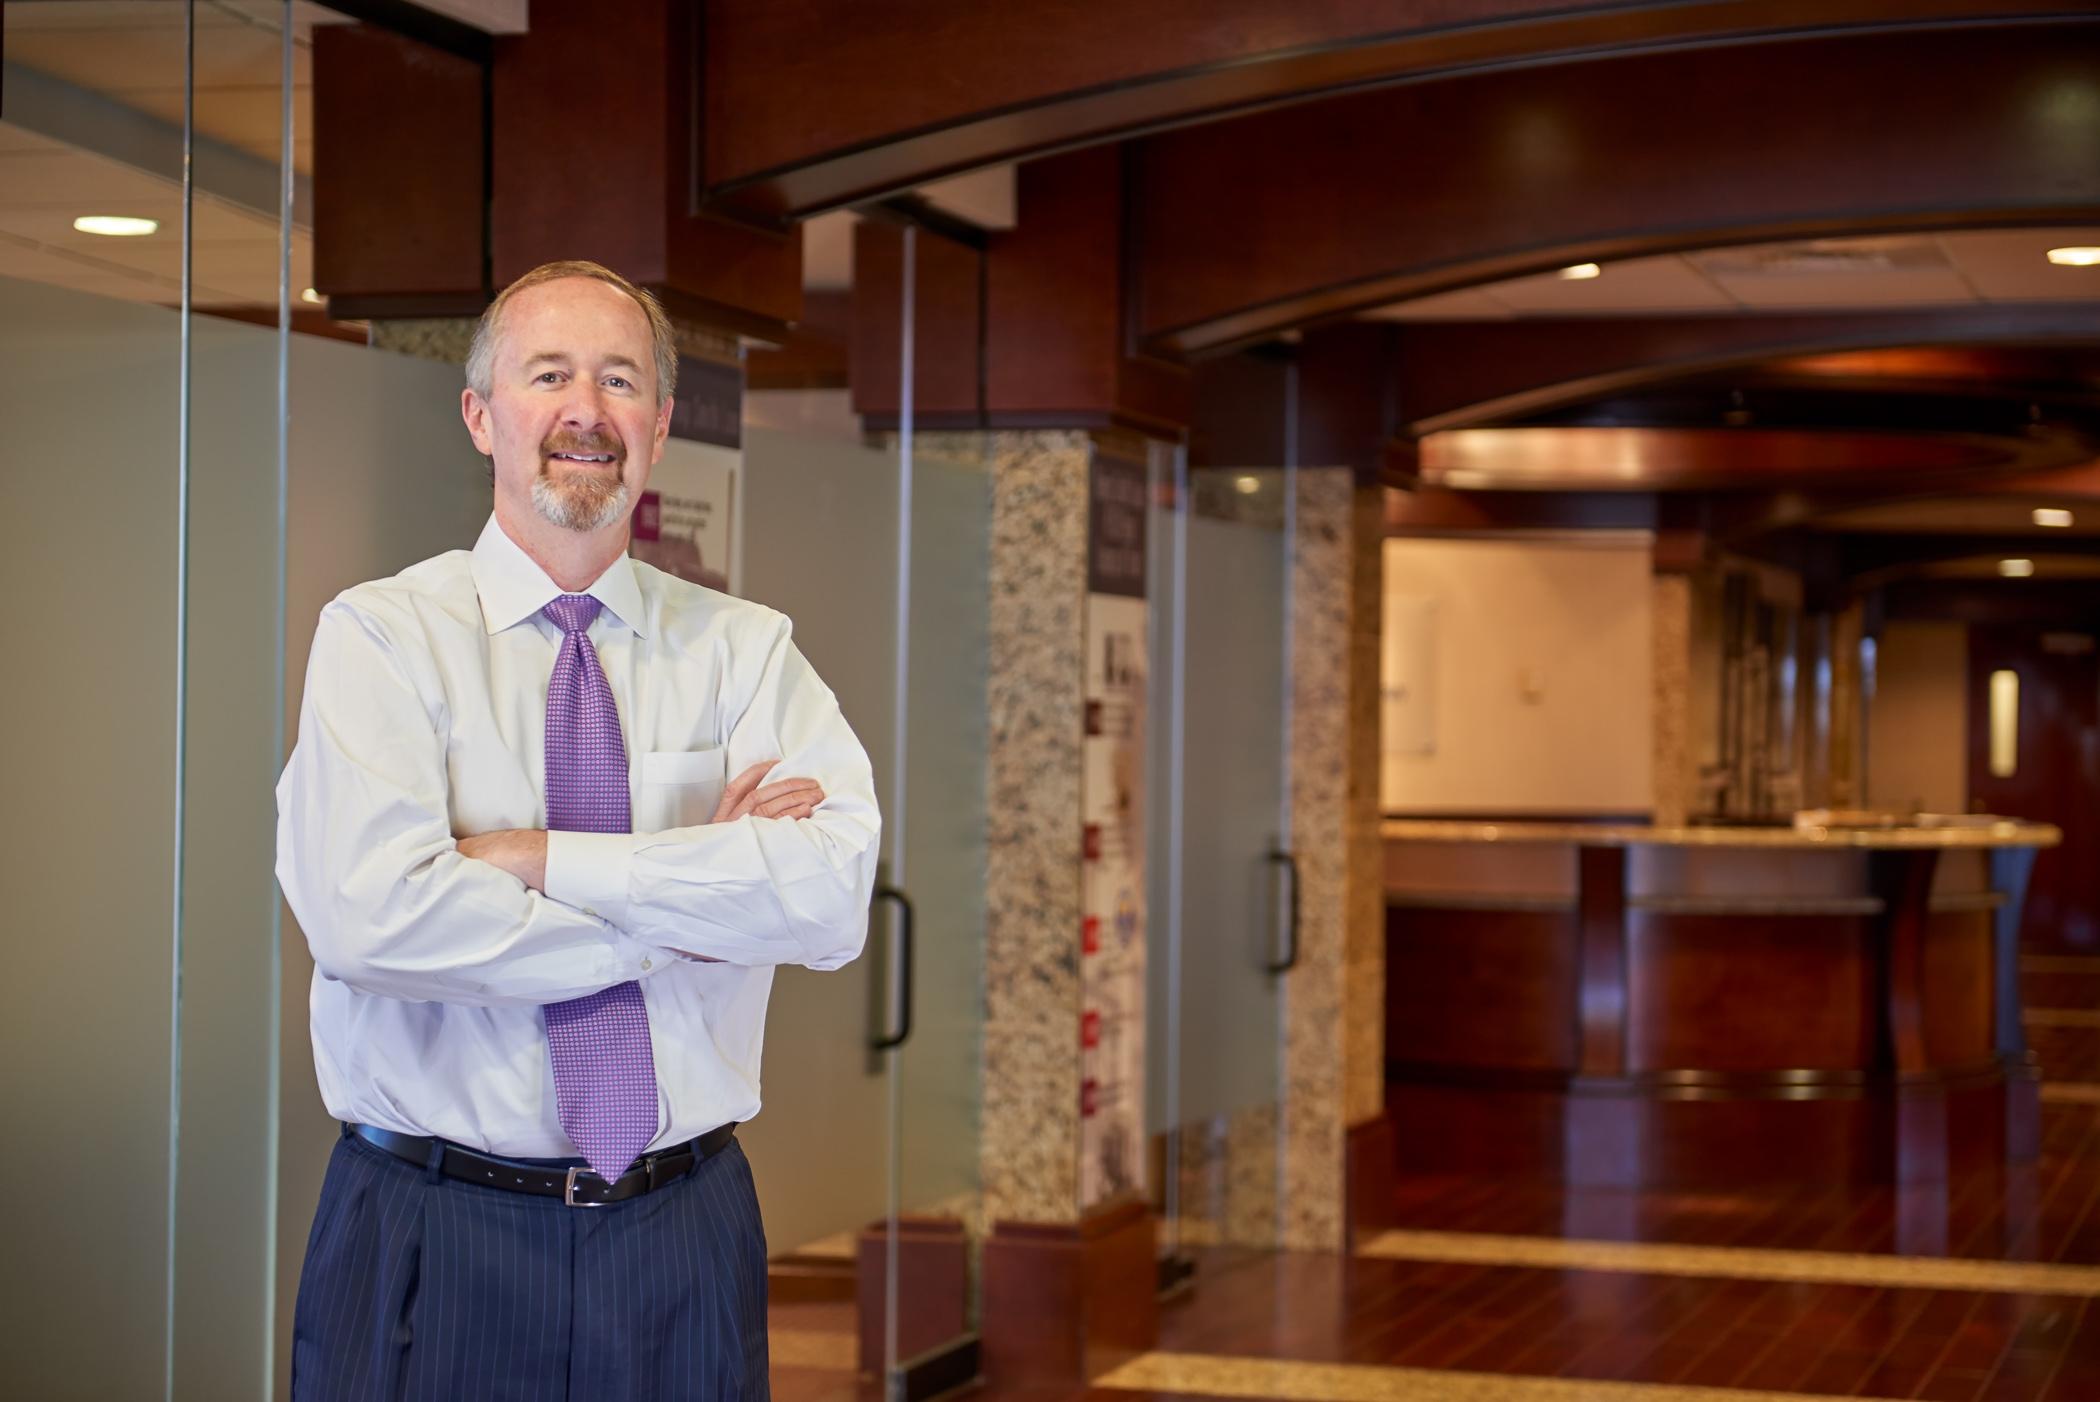 Gene Wolf | Attorney | Kemp Smith LLP | Law Firm in El Paso, Austin